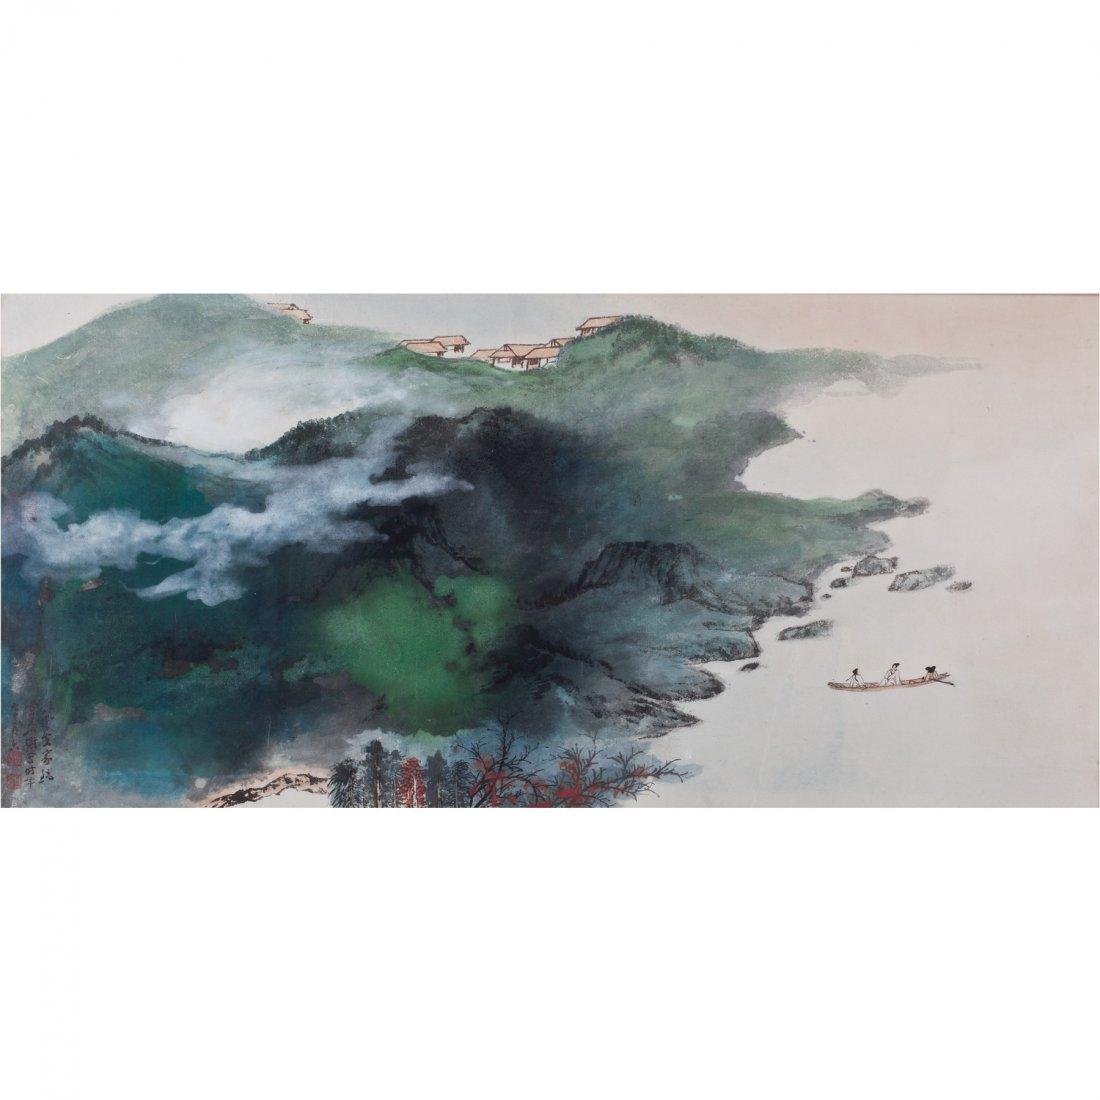 LANDSCAPE BY SUN YUNSHENG (1918-2000)